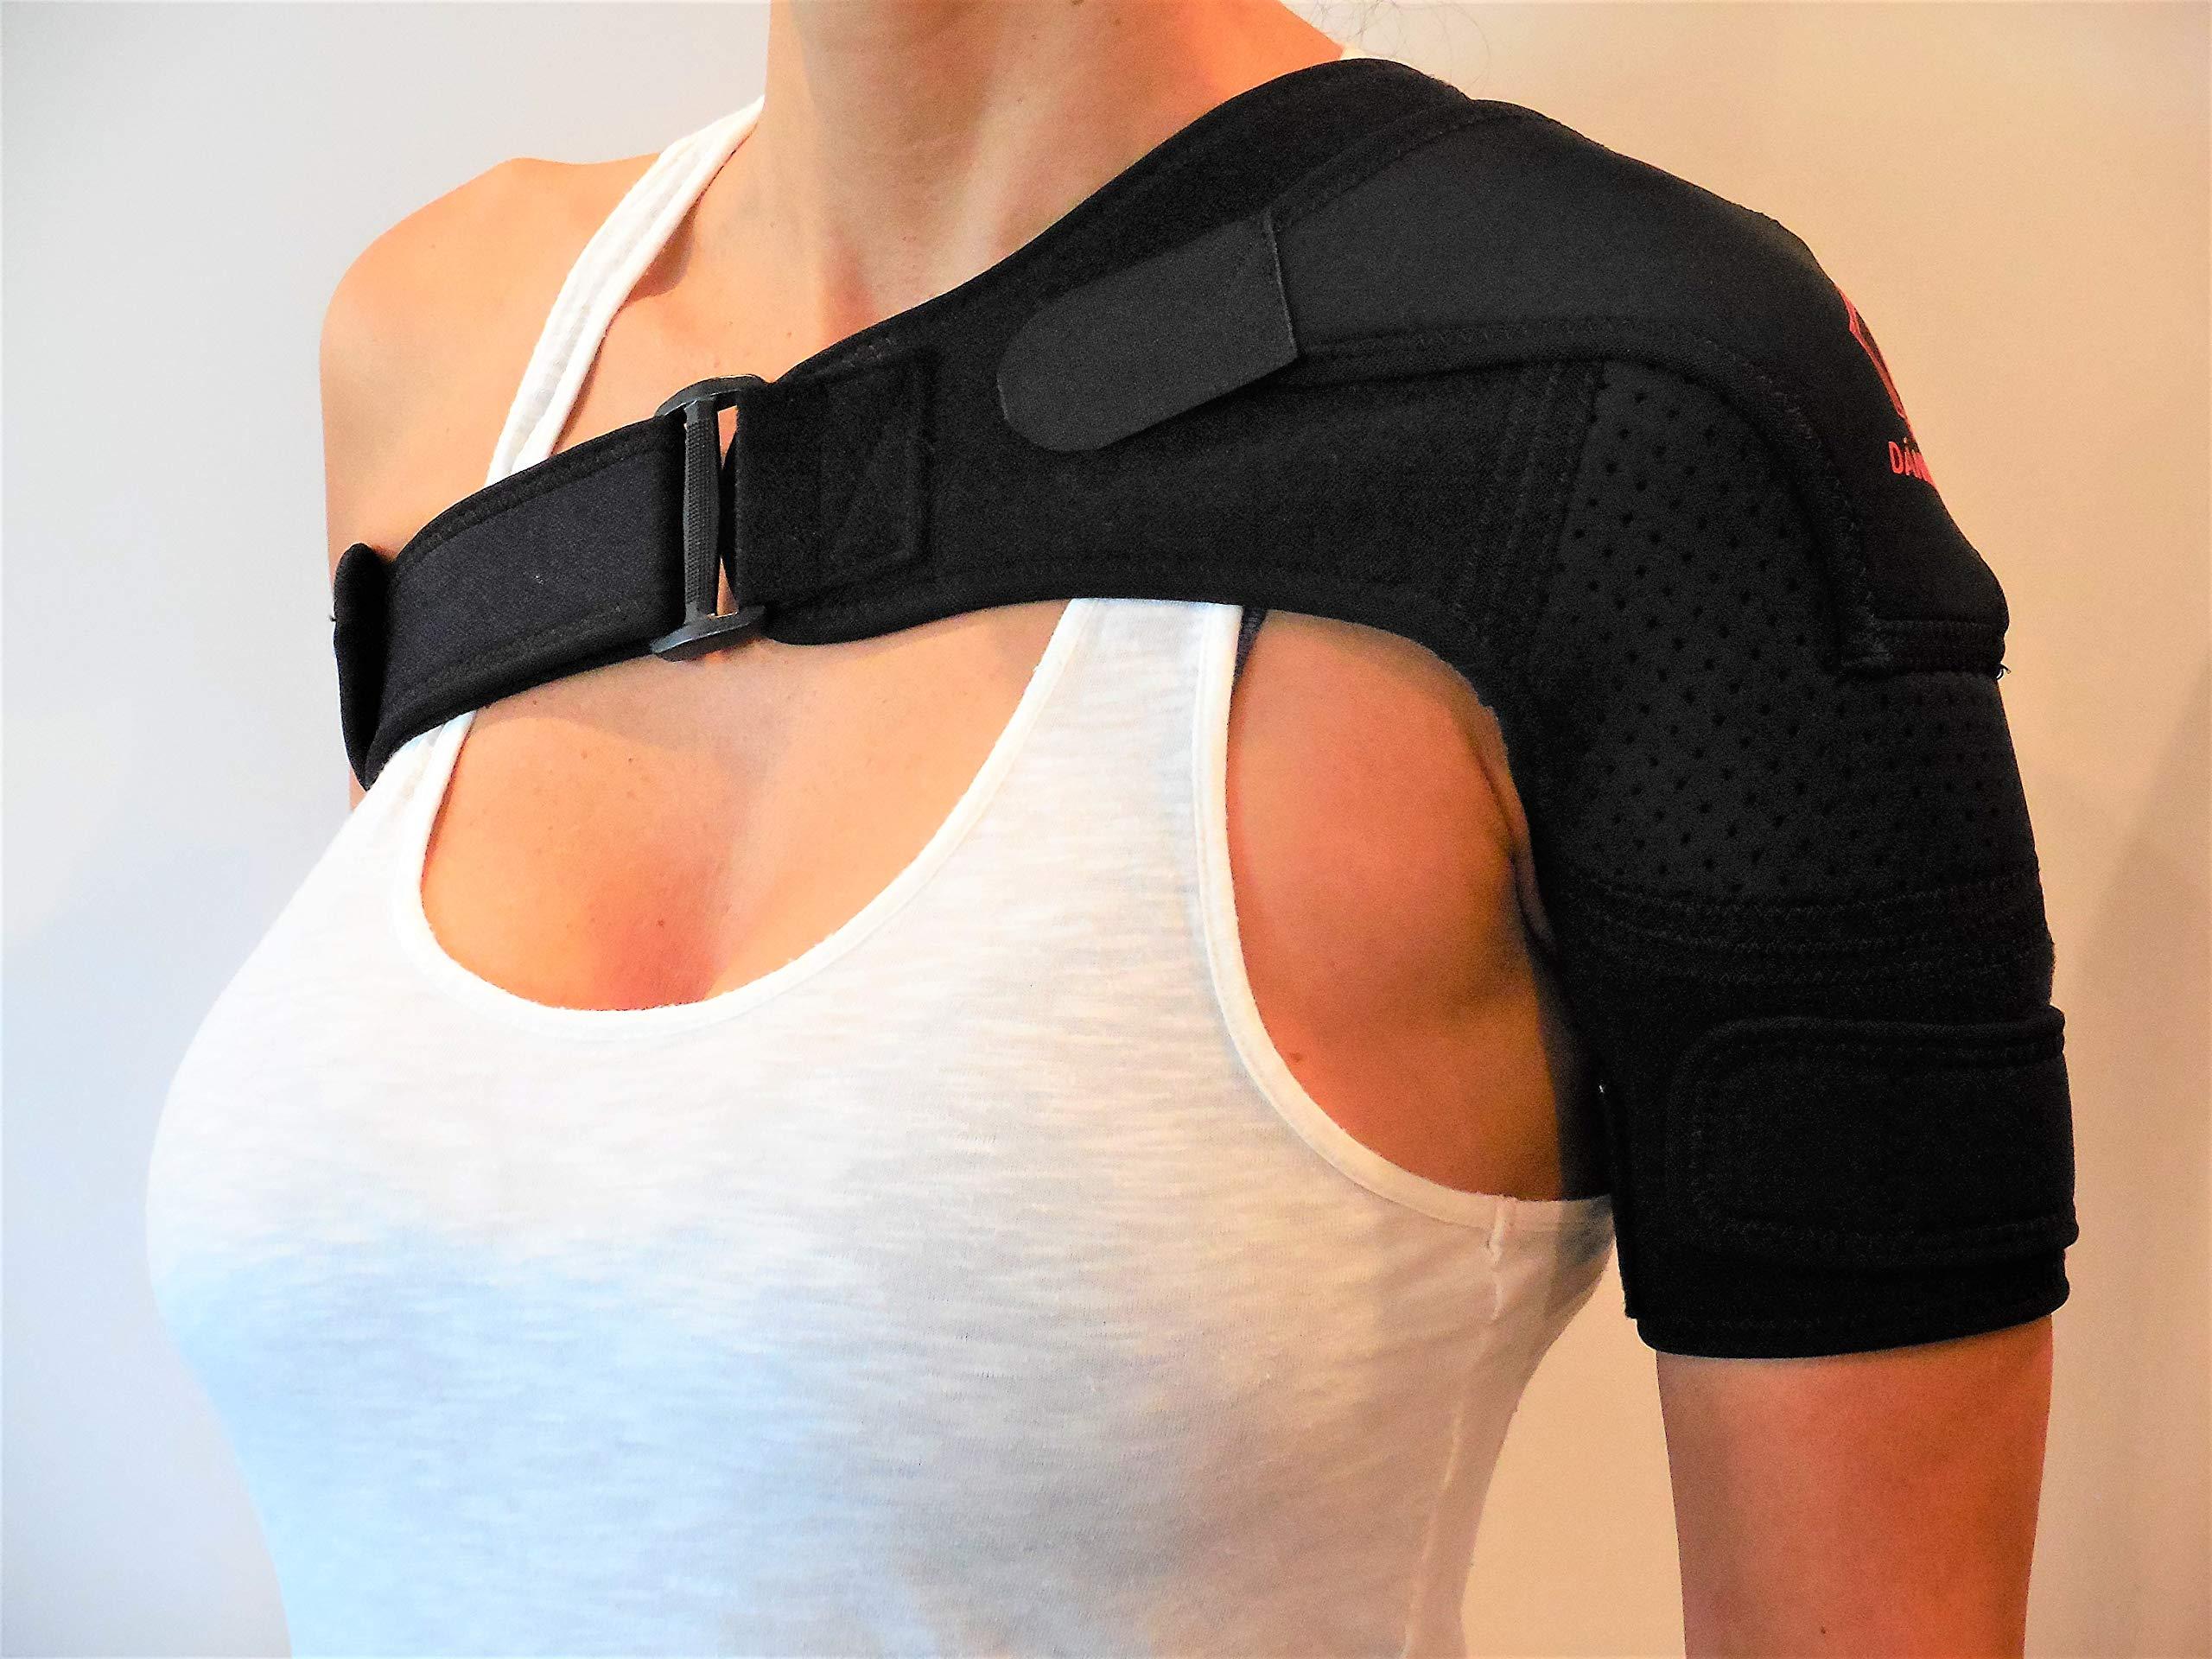 Shoulder Brace for Women and Men by DÁNIMO - Lightweight Neoprene Shoulder Support for Rotator Cuff, Shoulder Pain, Tendonitis, Bursitis - Adjustable Shoulder Compression Sleeve for Cold/Heat Therapy